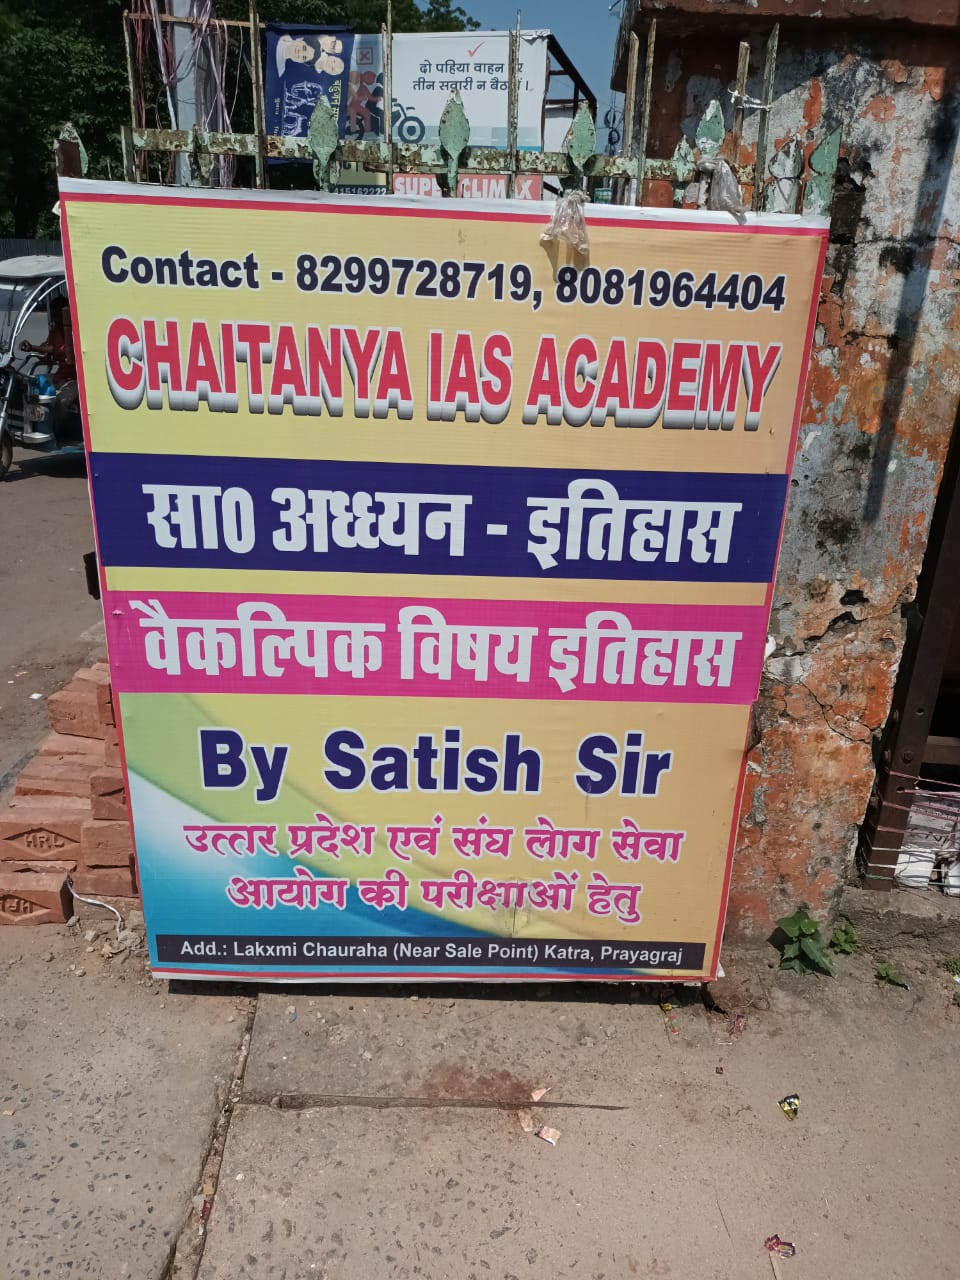 Chaitanya IAS Academy Logo